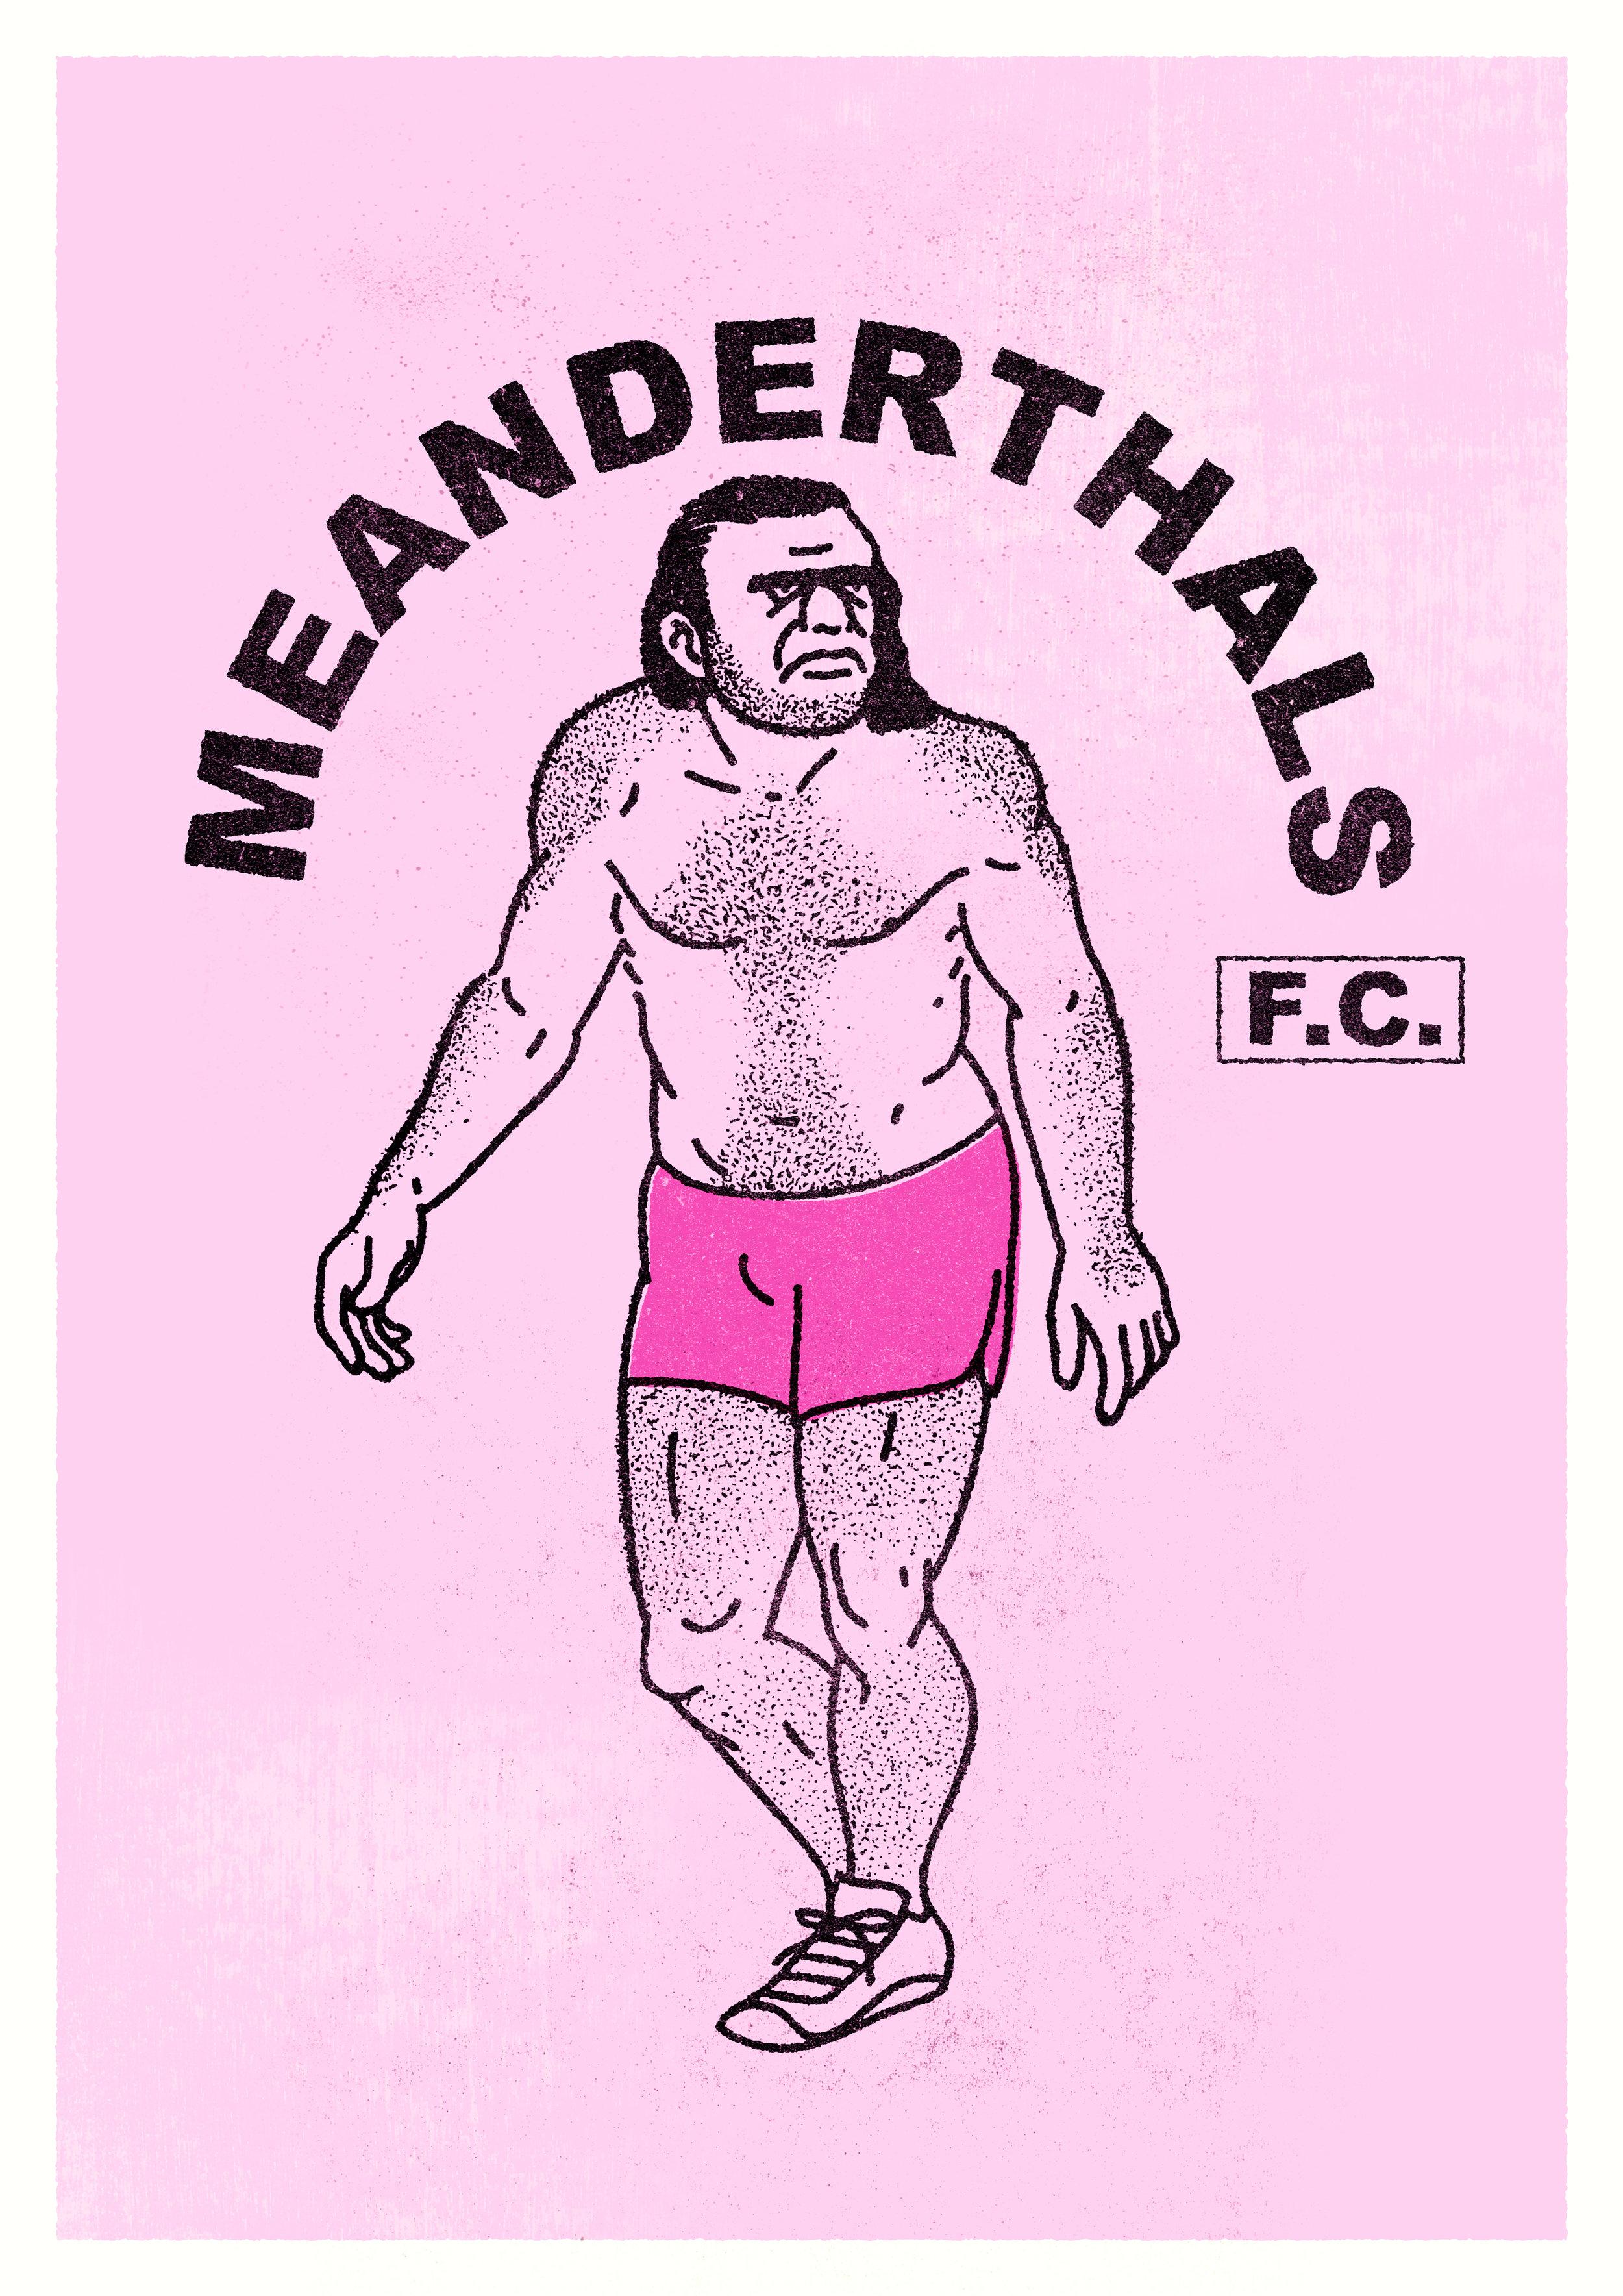 Meanderthal-Poster.jpg